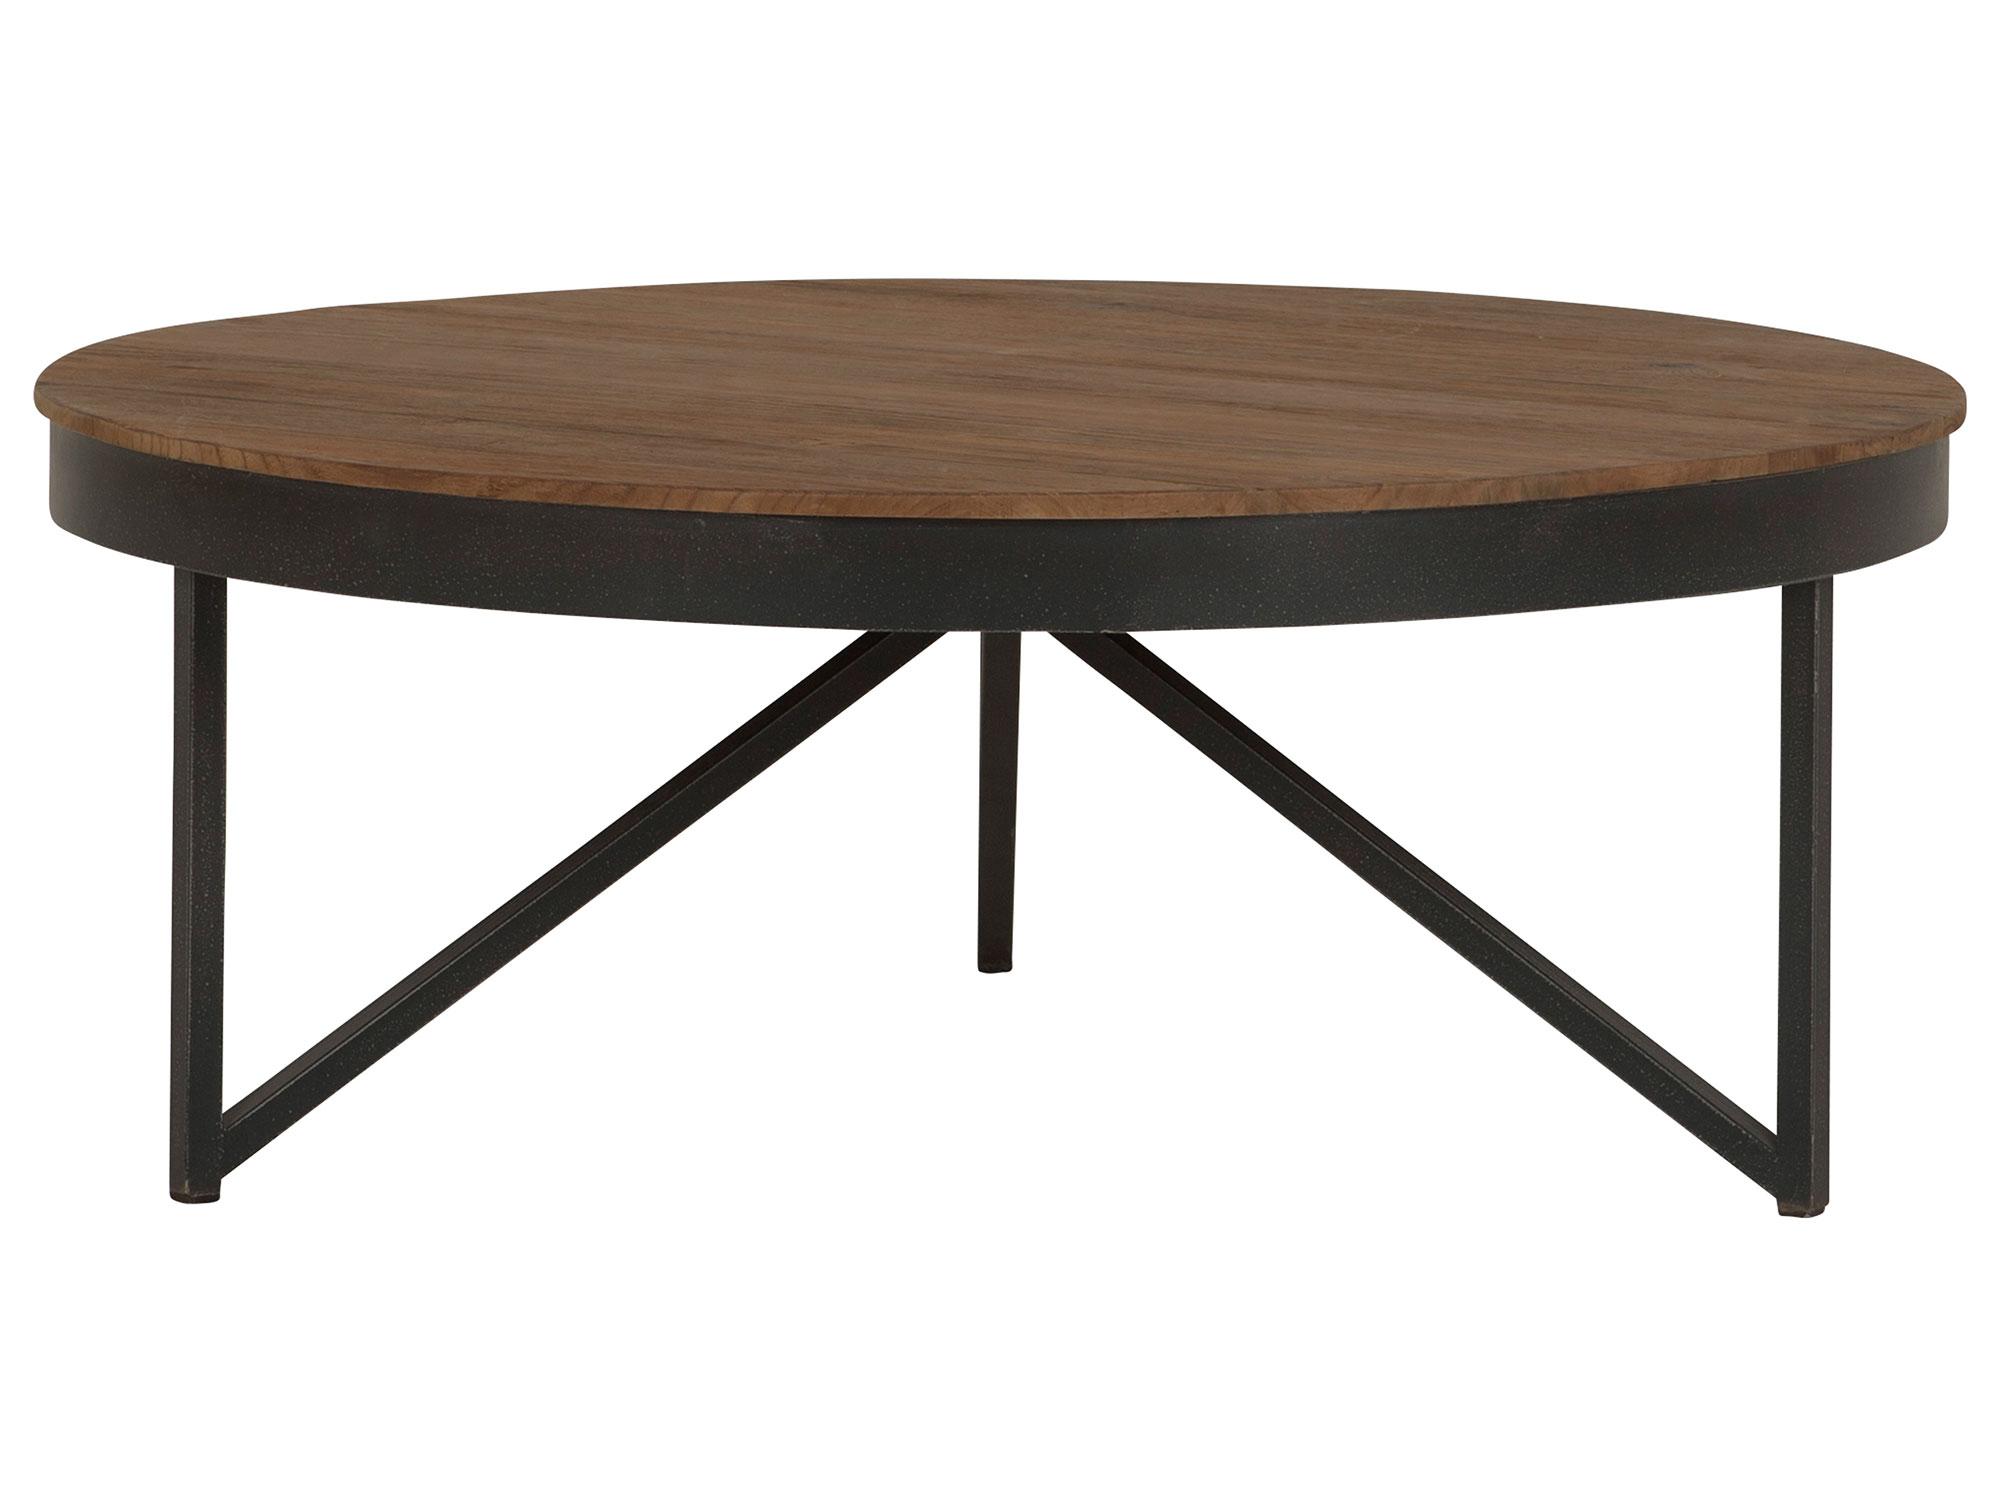 Salontafel fendy rond large Ø cm fØrn maatwerk meubelen